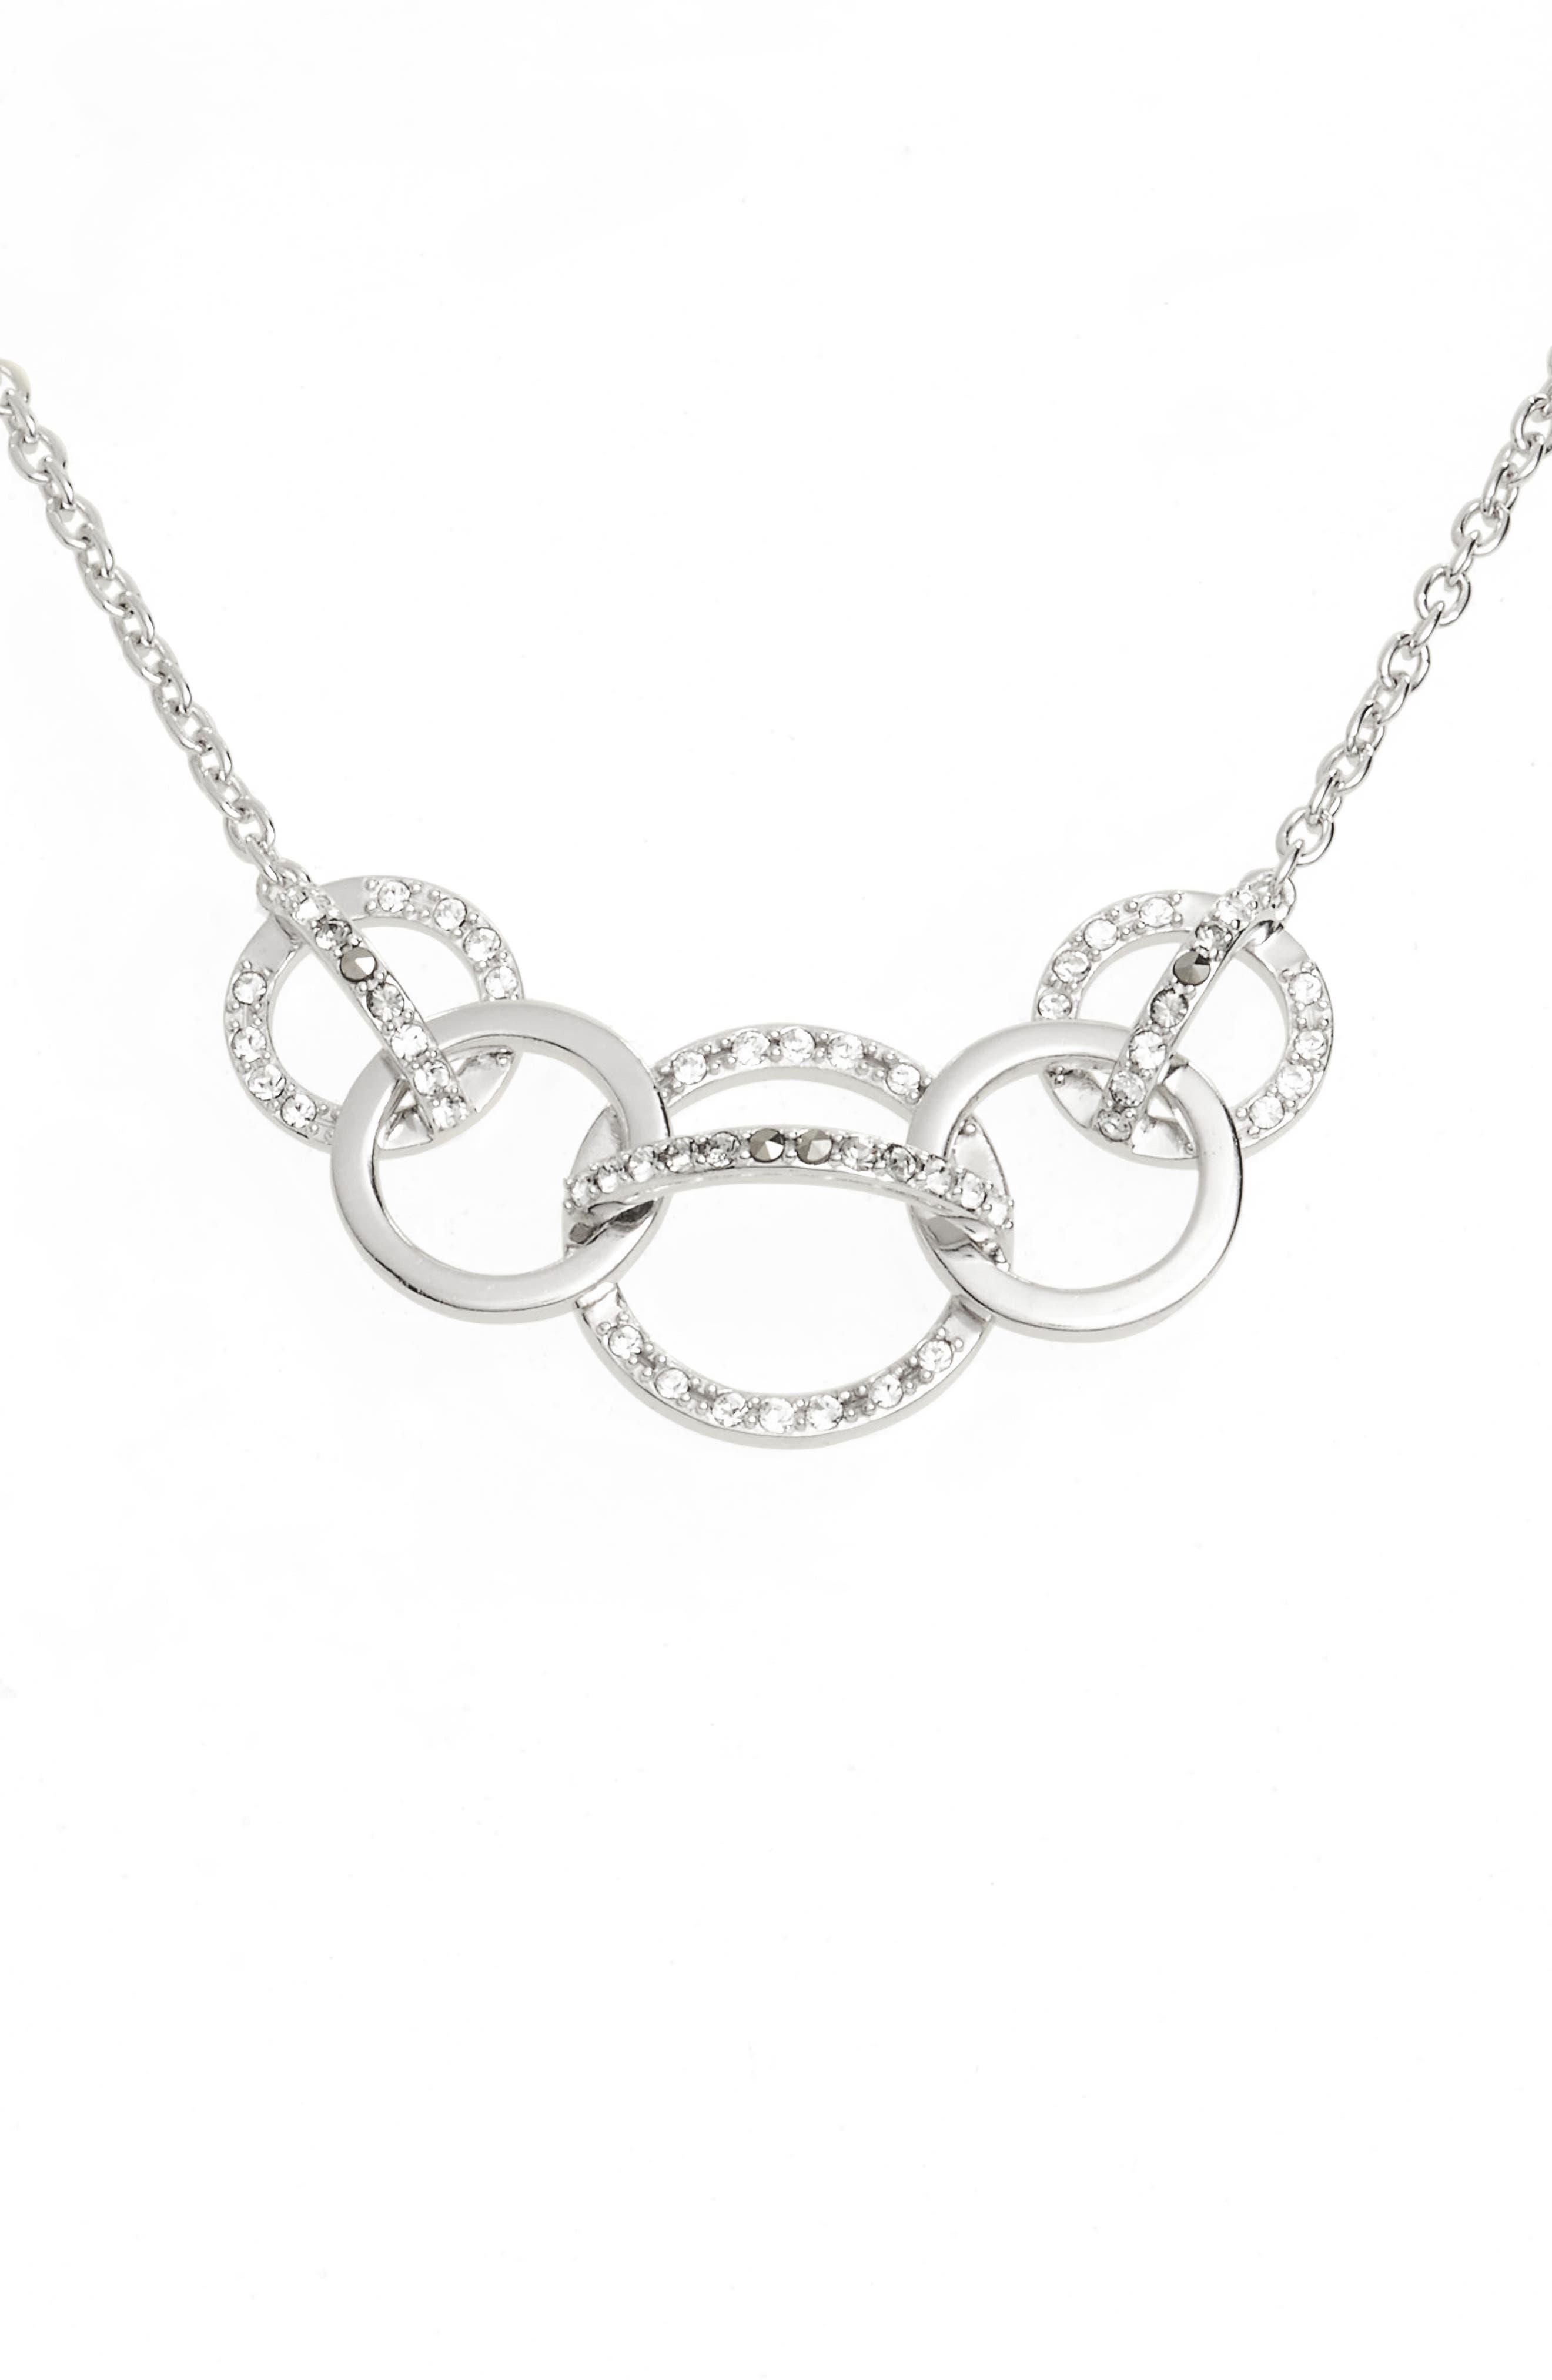 Silver Sparkle Crystal Collar Necklace,                             Main thumbnail 1, color,                             Black Diamond/ Marcasite